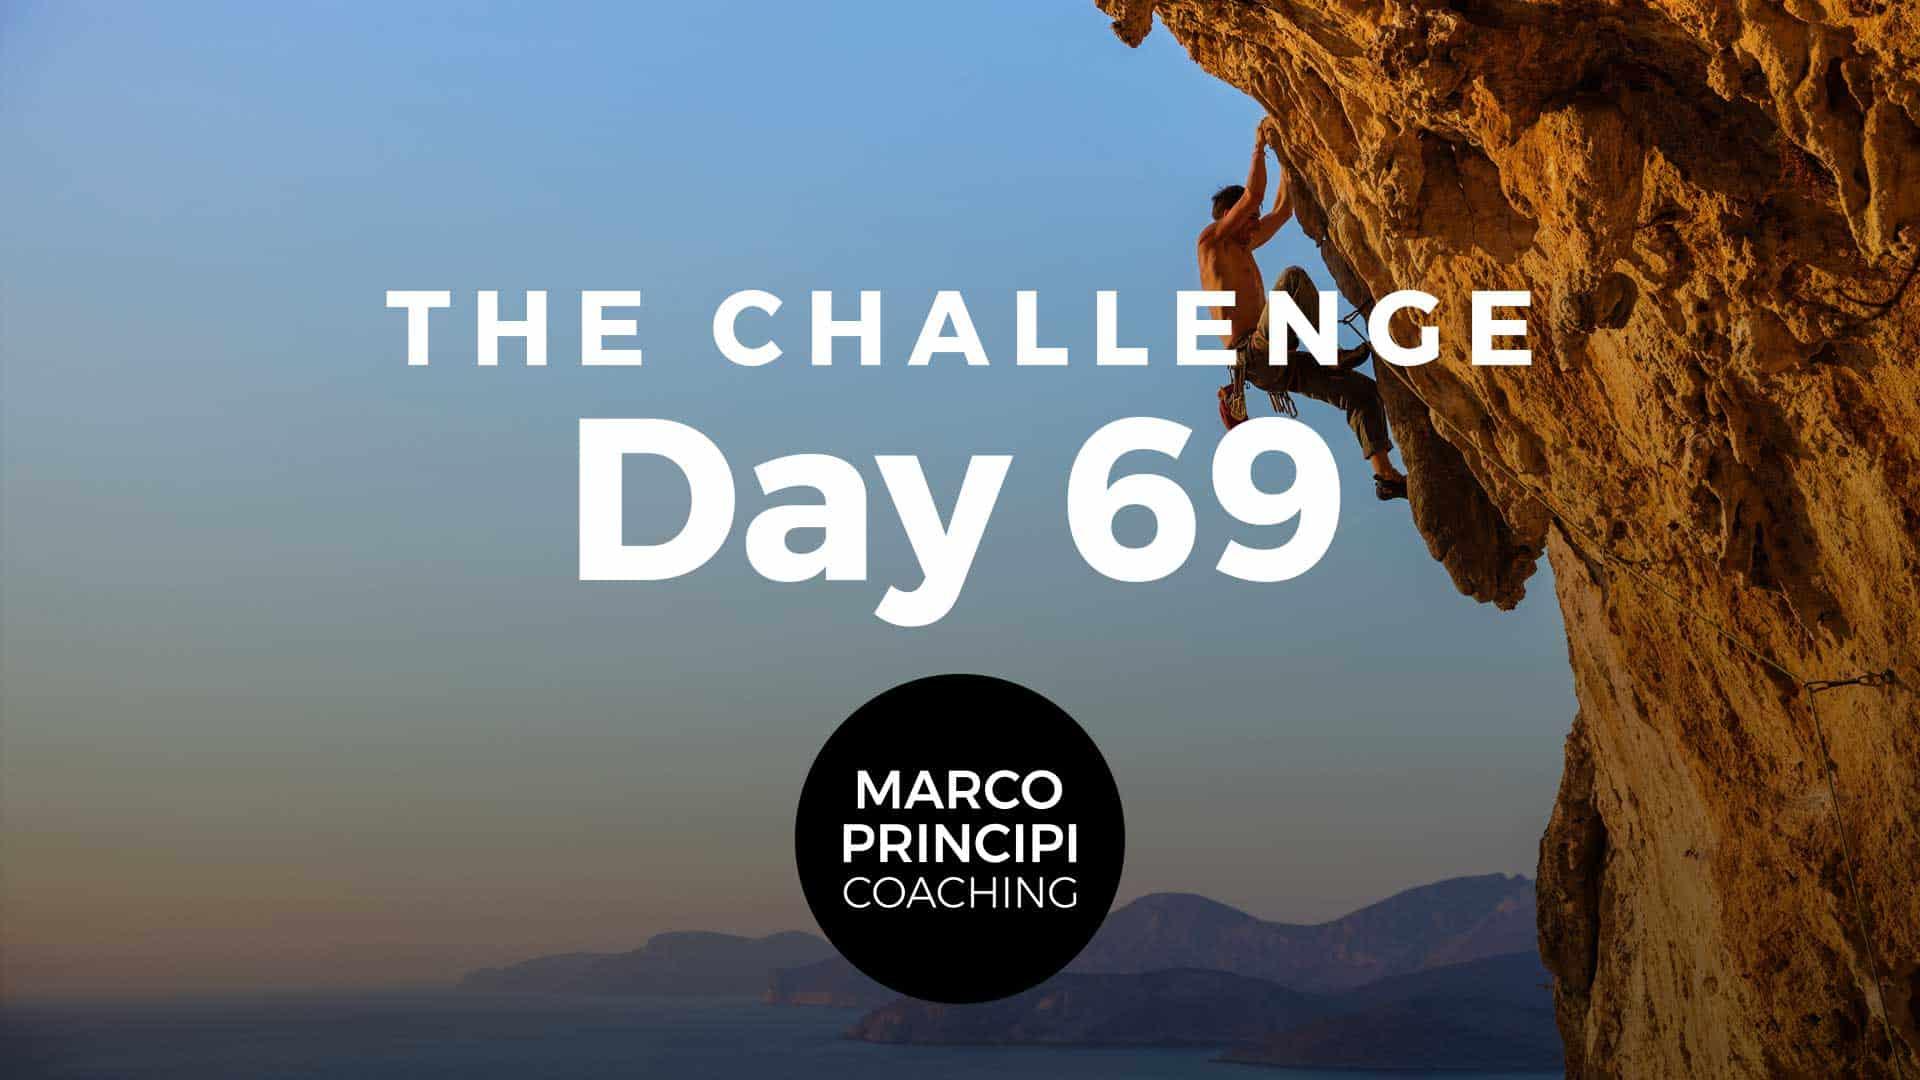 Marco Principi Coaching Challenge Day 69